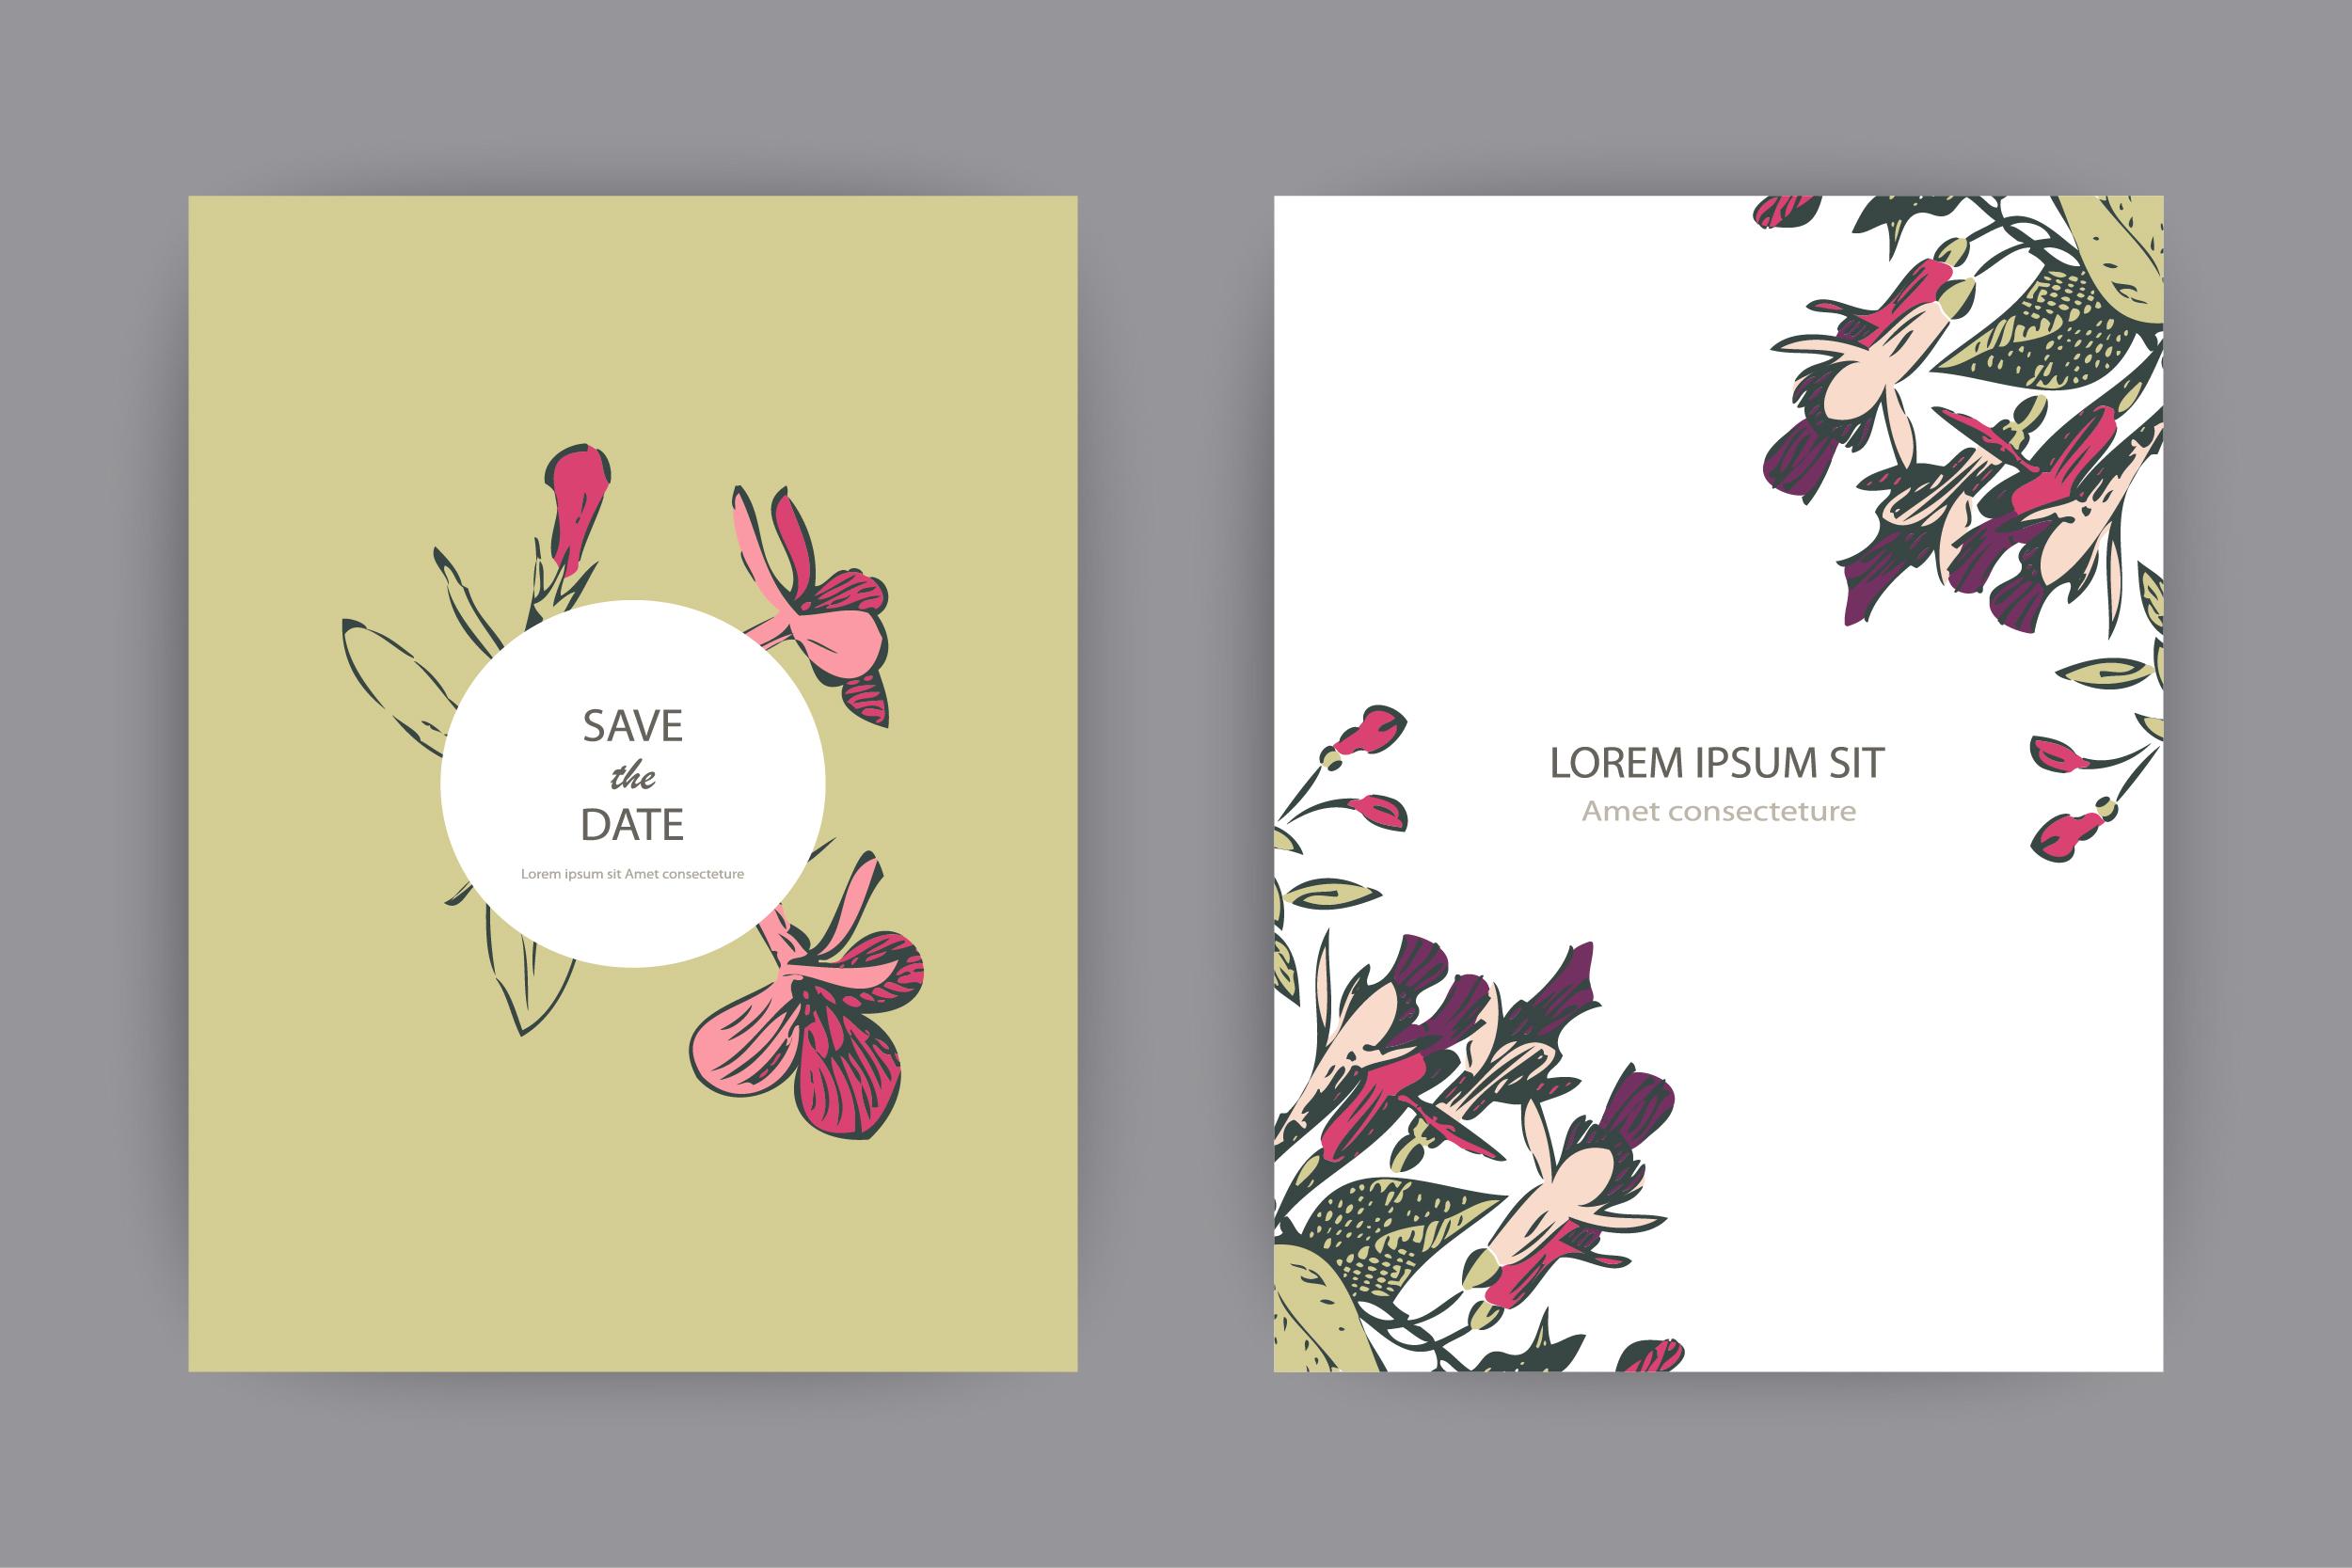 Fuchsia flowers templates for card, invitation, wedding example image 1